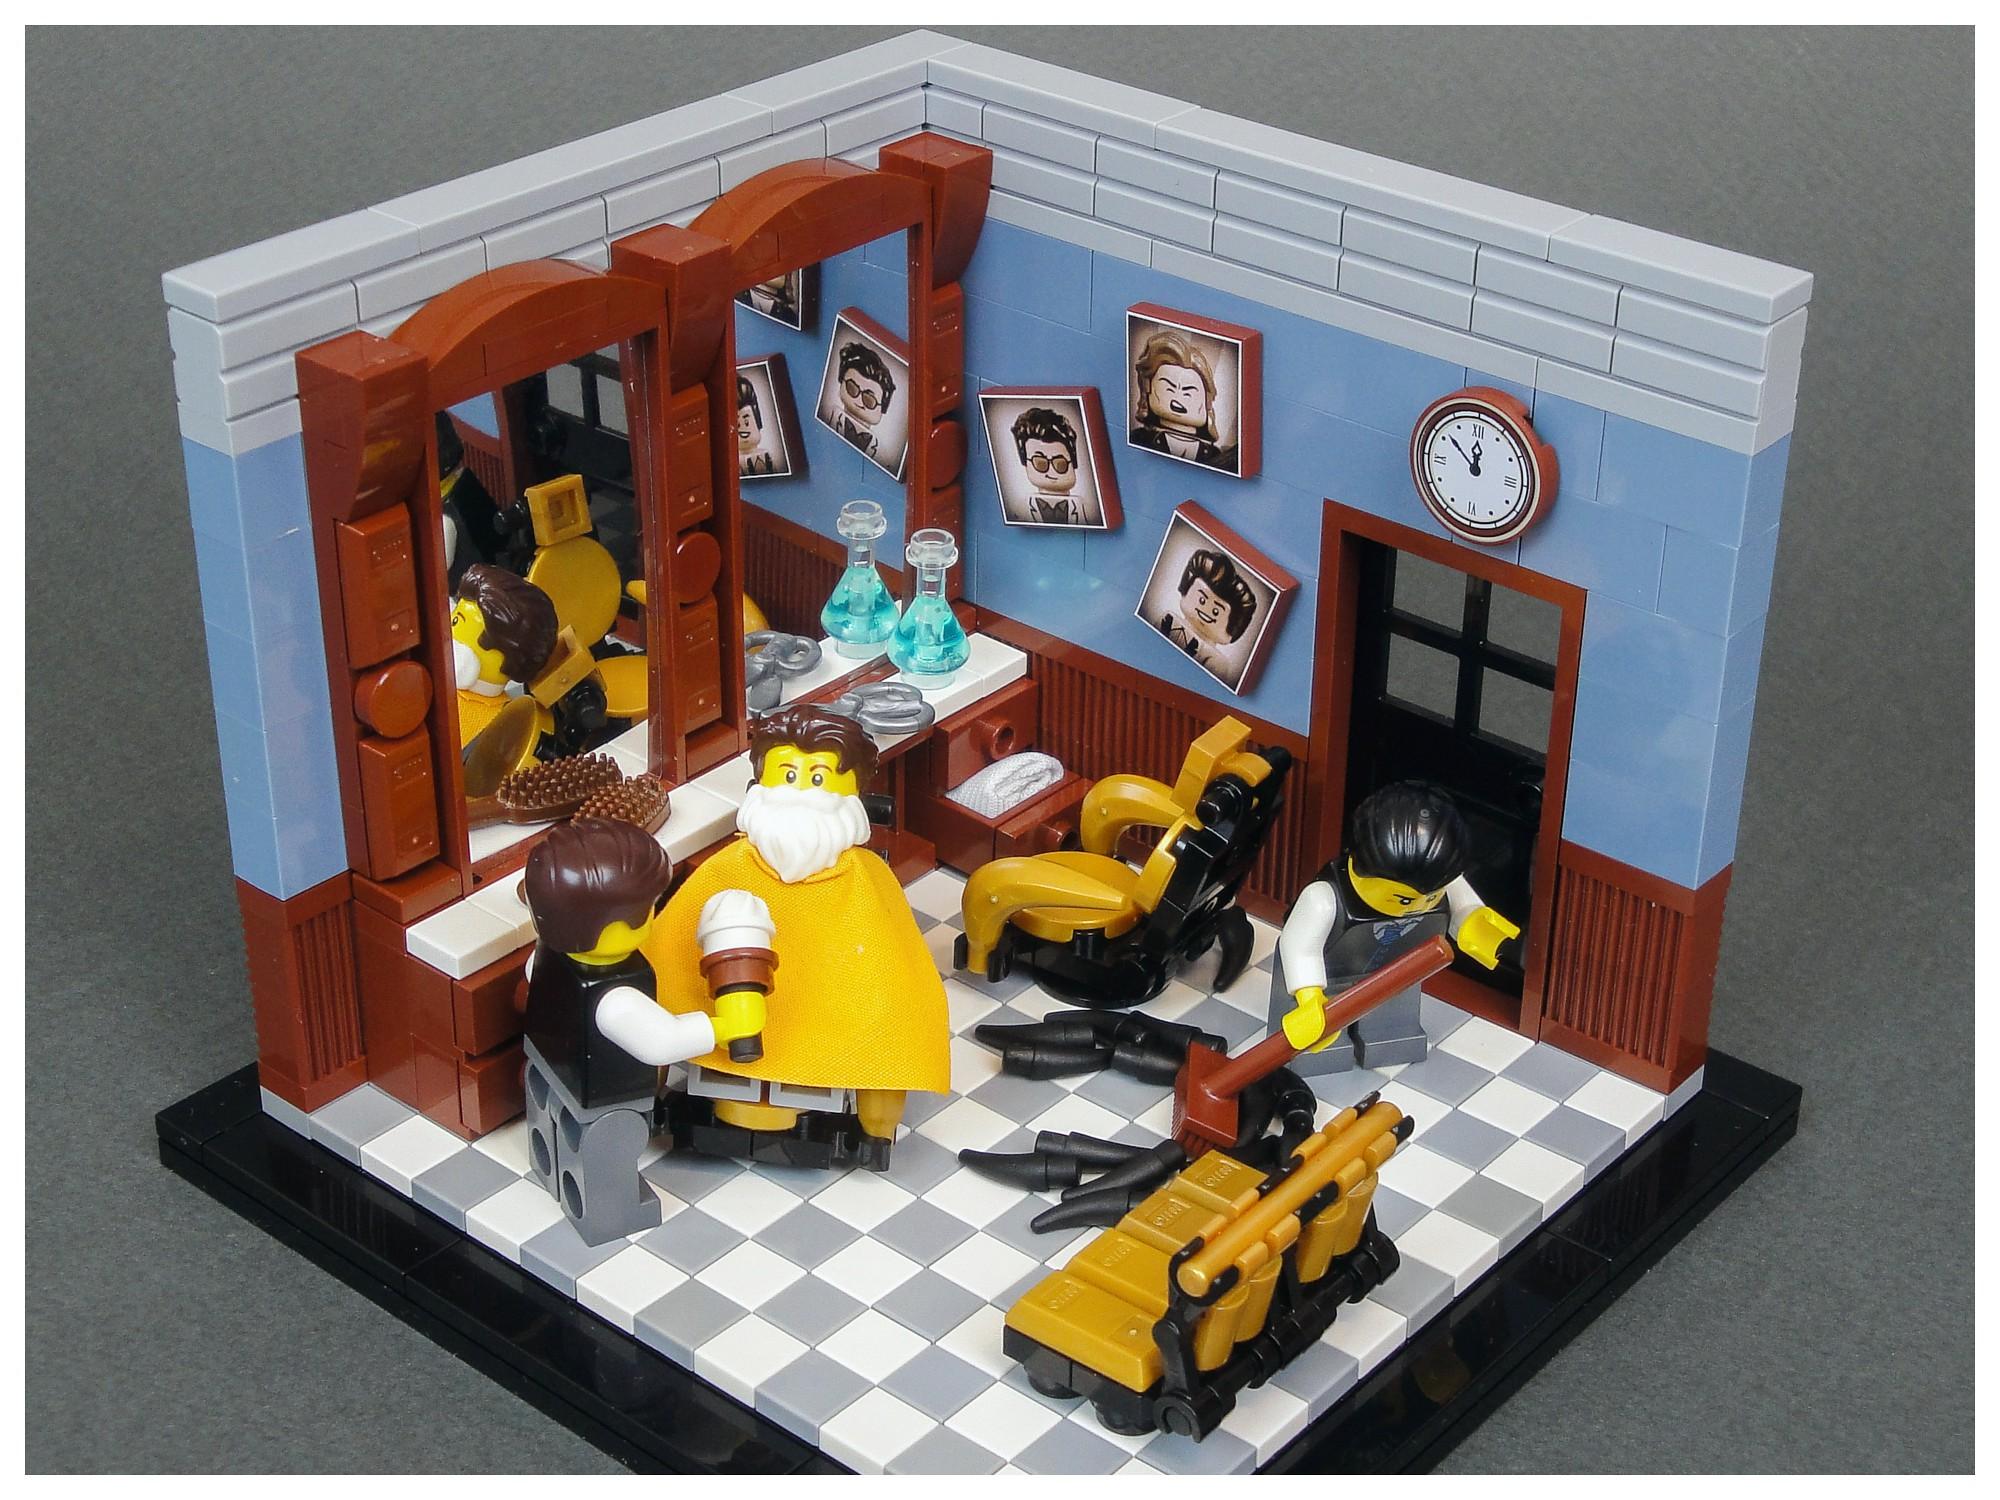 LEGO Barbershop - Maxim Baybakov